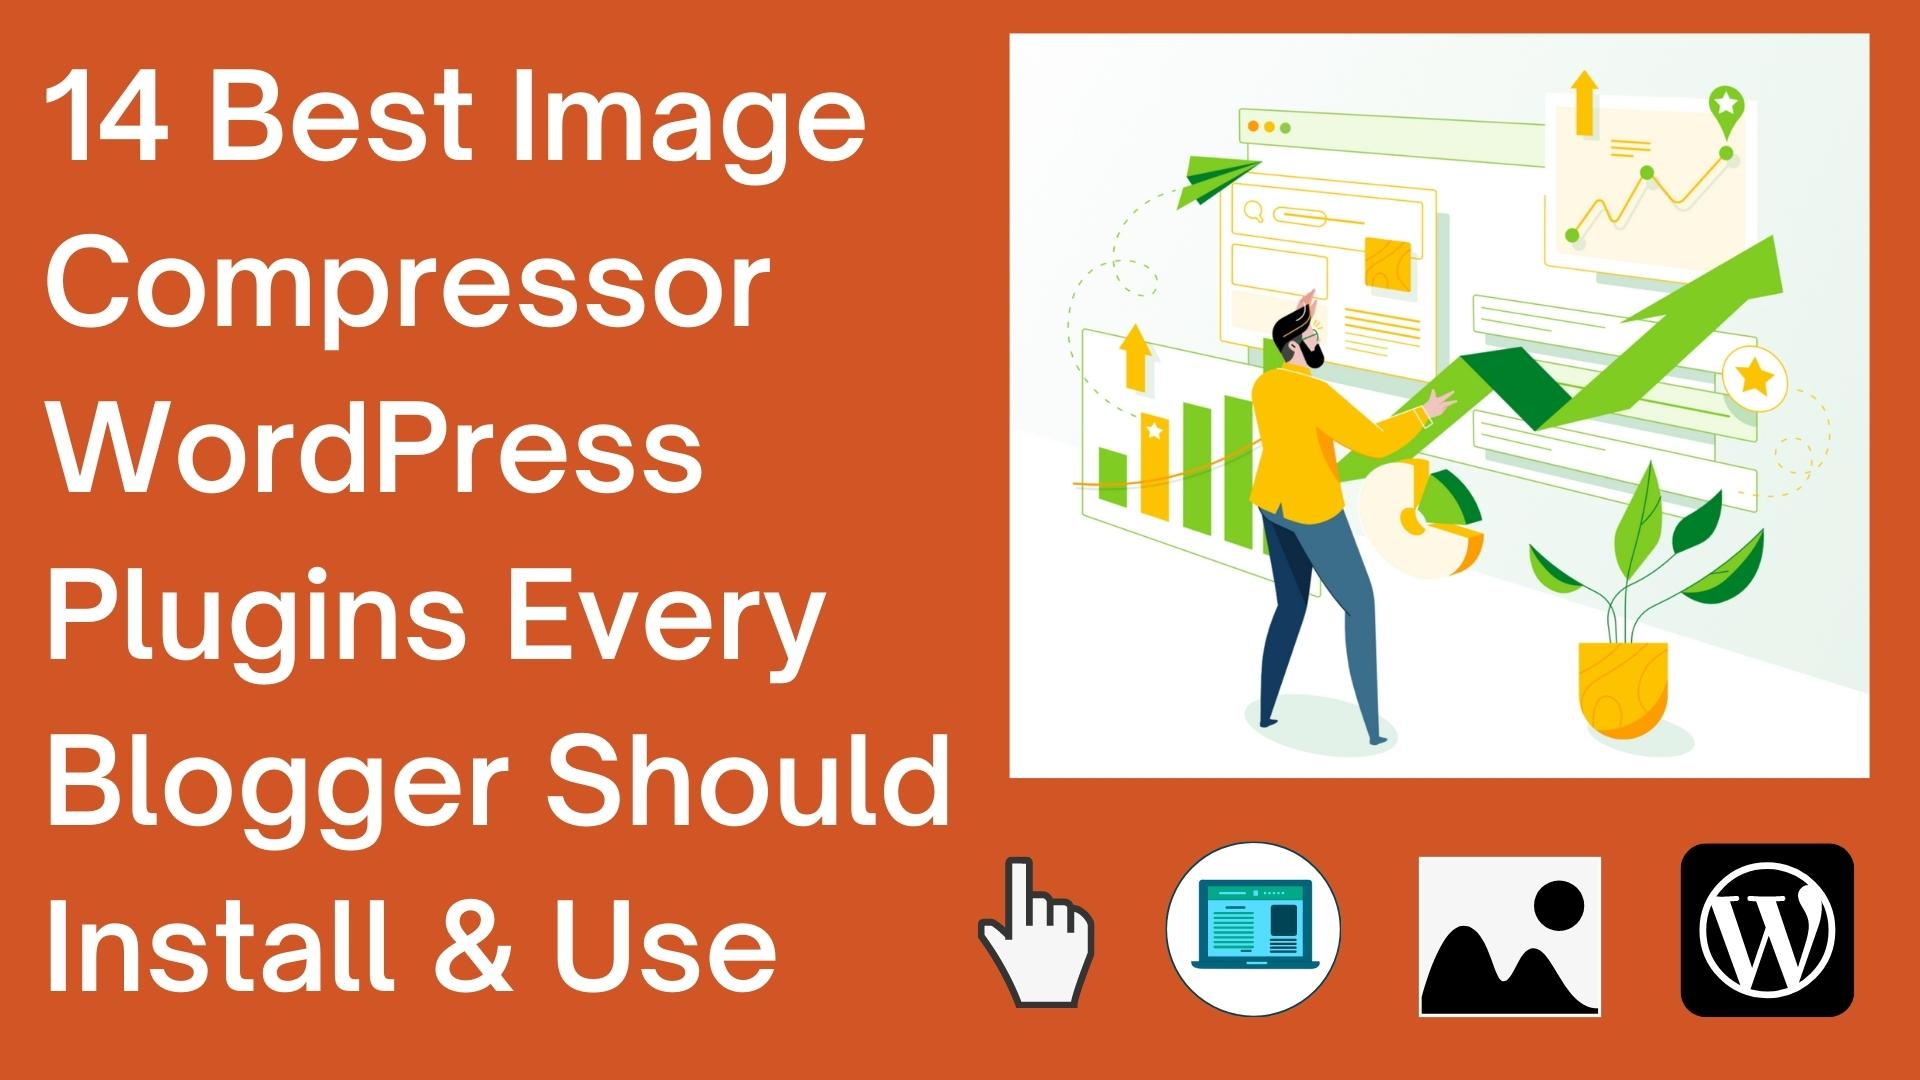 image compressor plugins